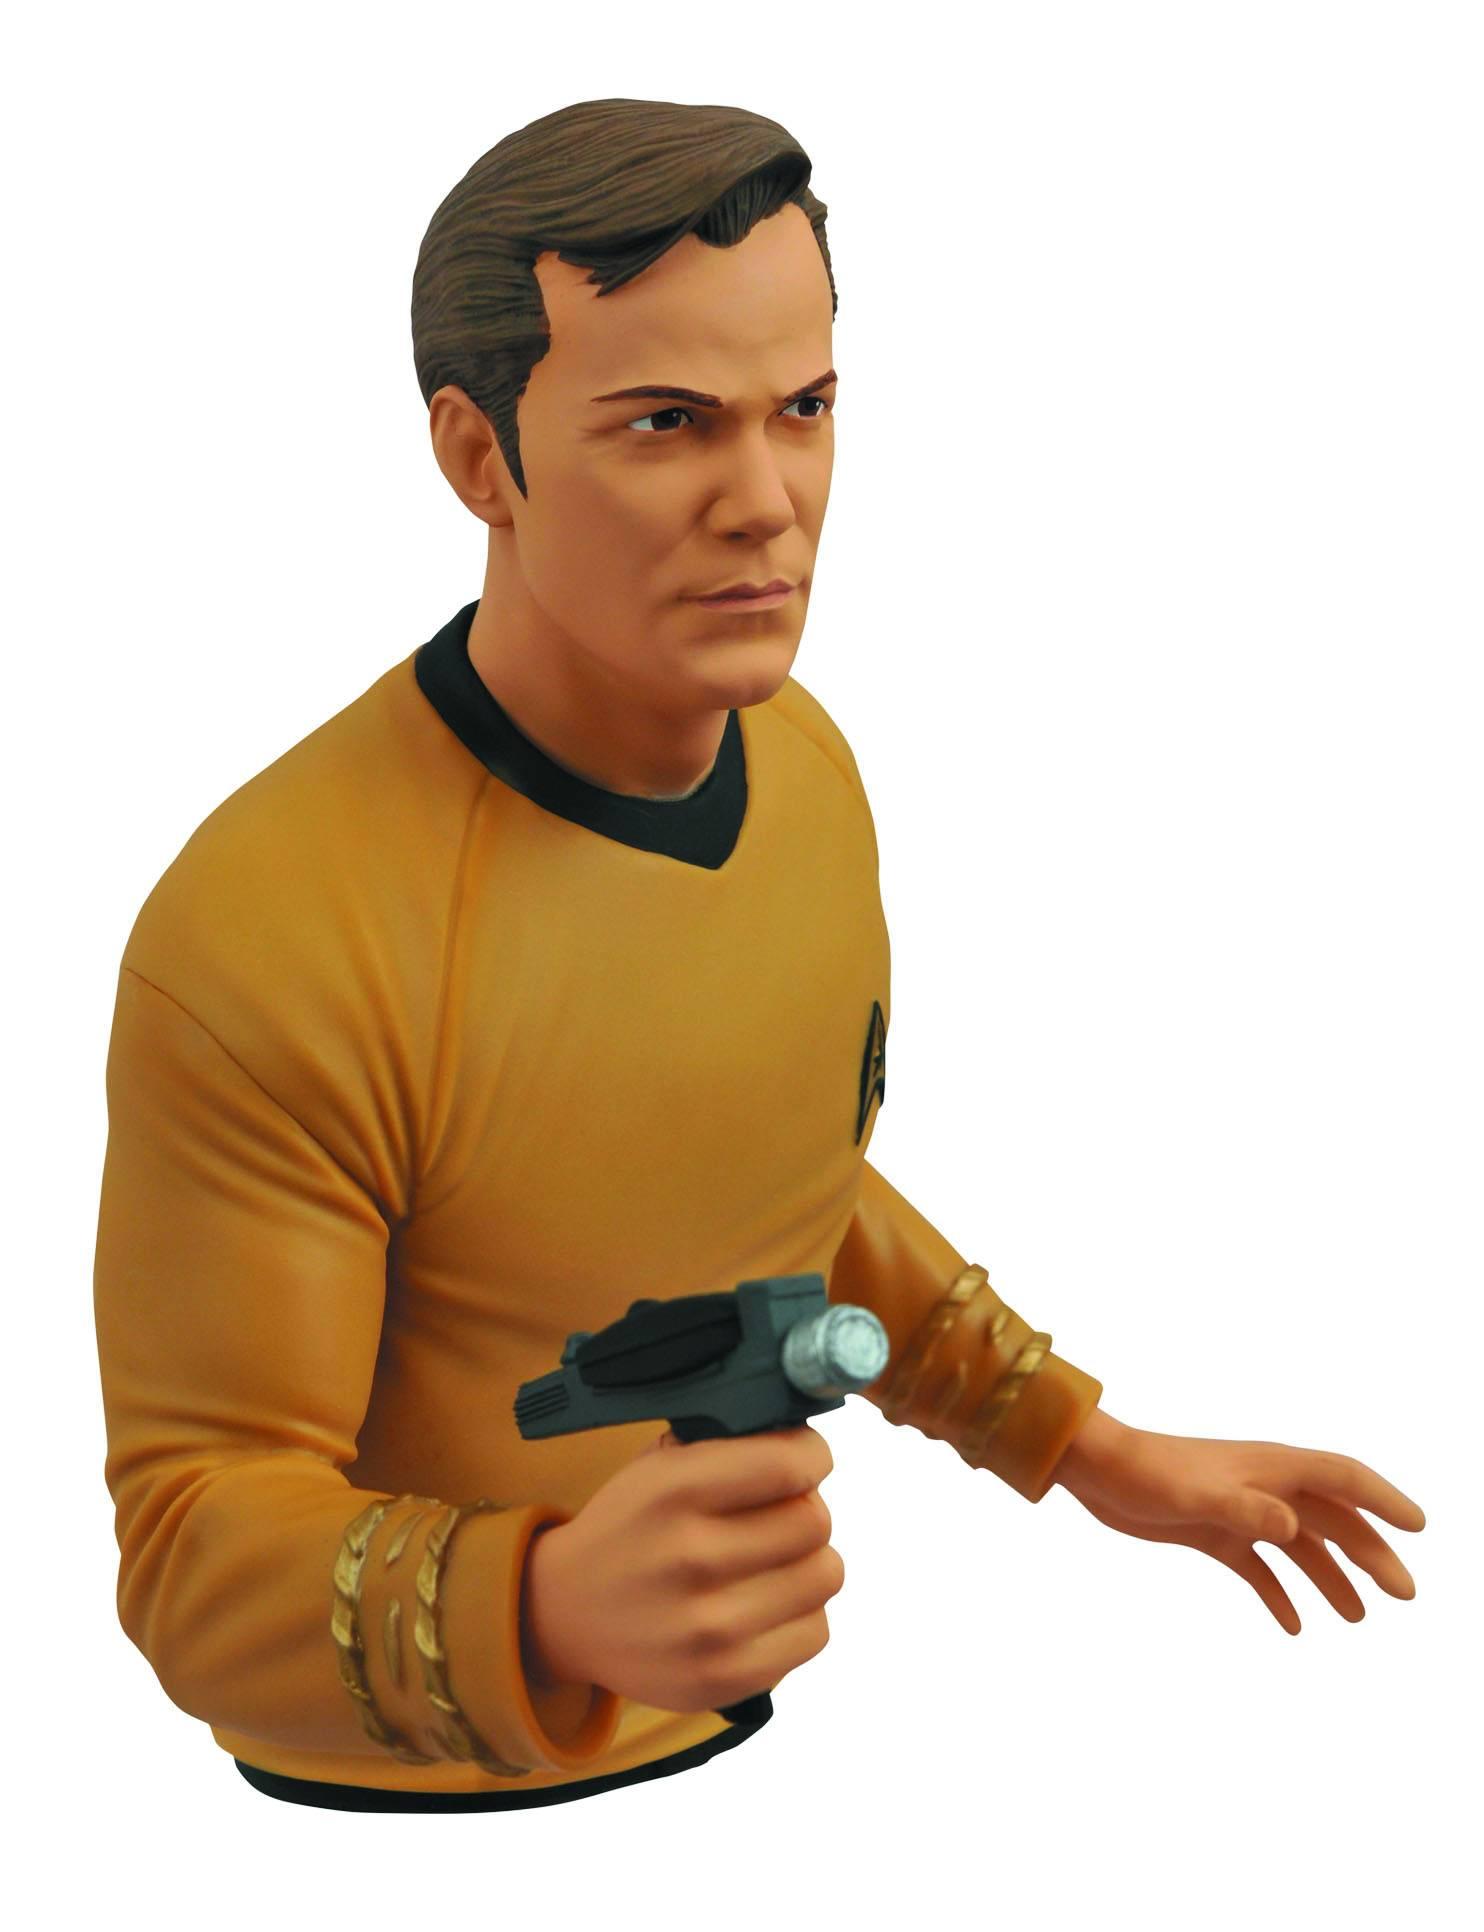 Capitão Kirk Bust Bank ( Capitão James T. Kirk ) - Star Trek - Diamond Select Toys